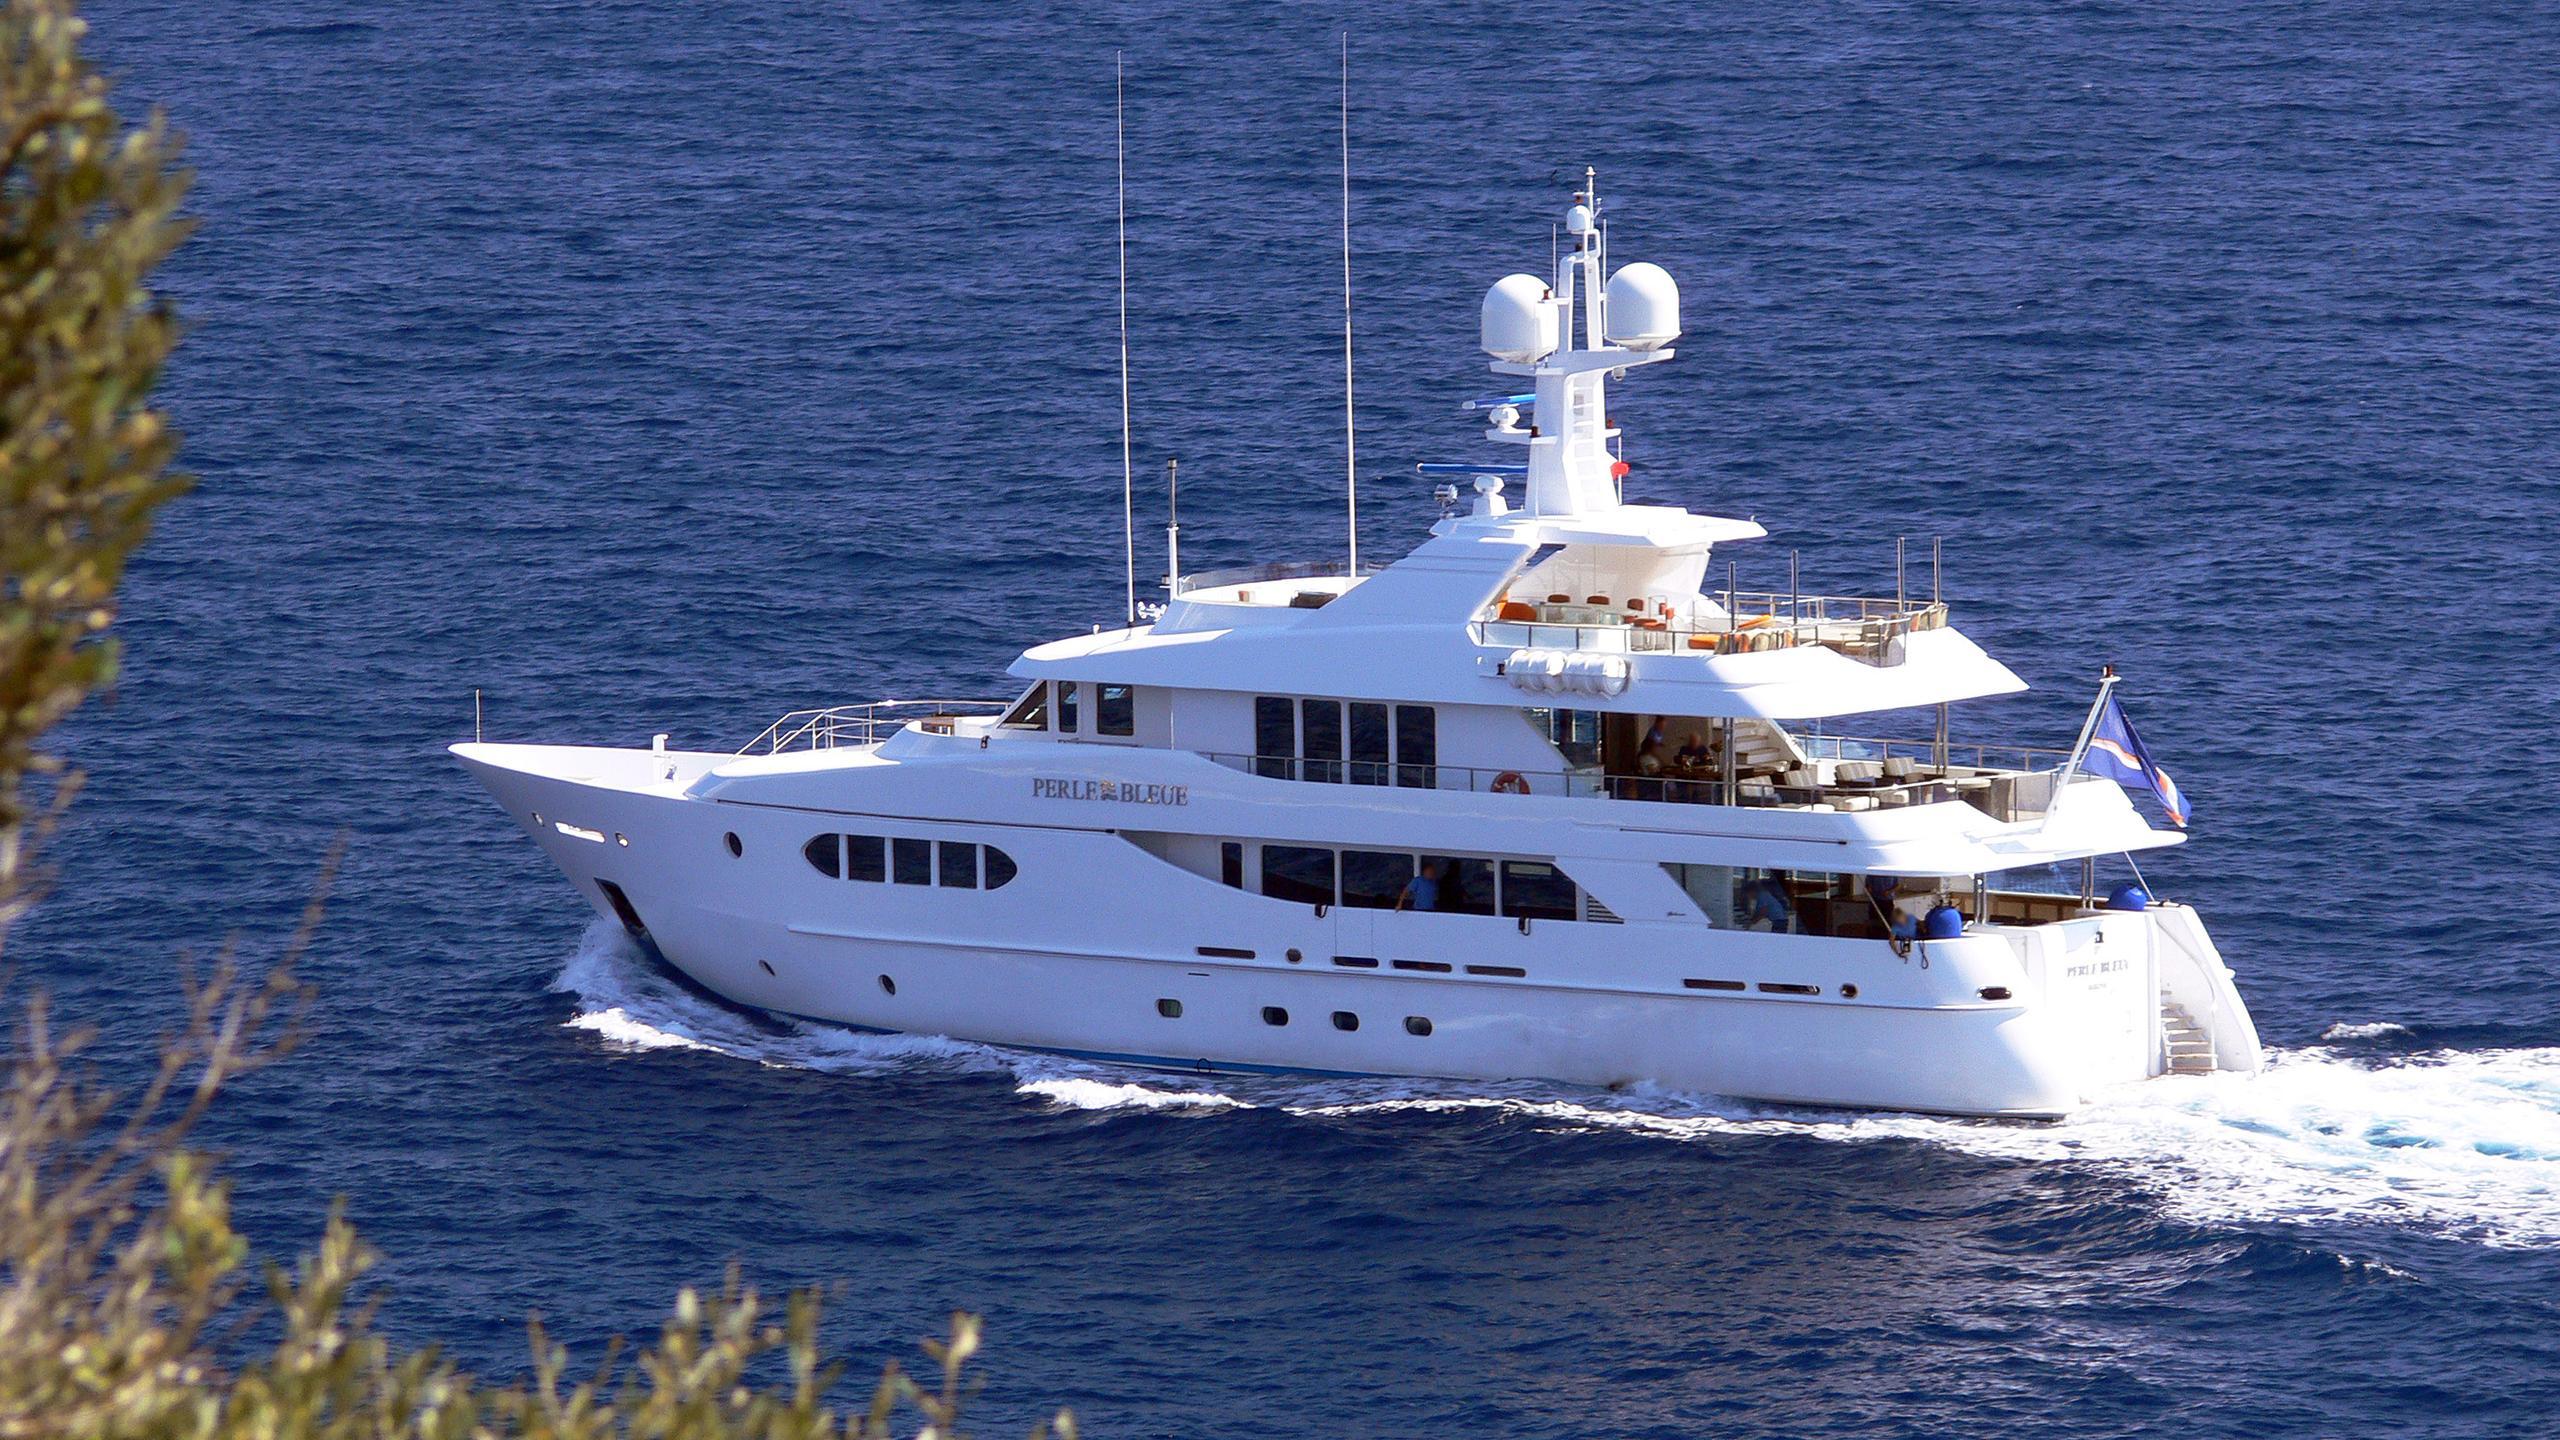 perle-bleue-motor-yacht-hakvoort-2007-38m-stern